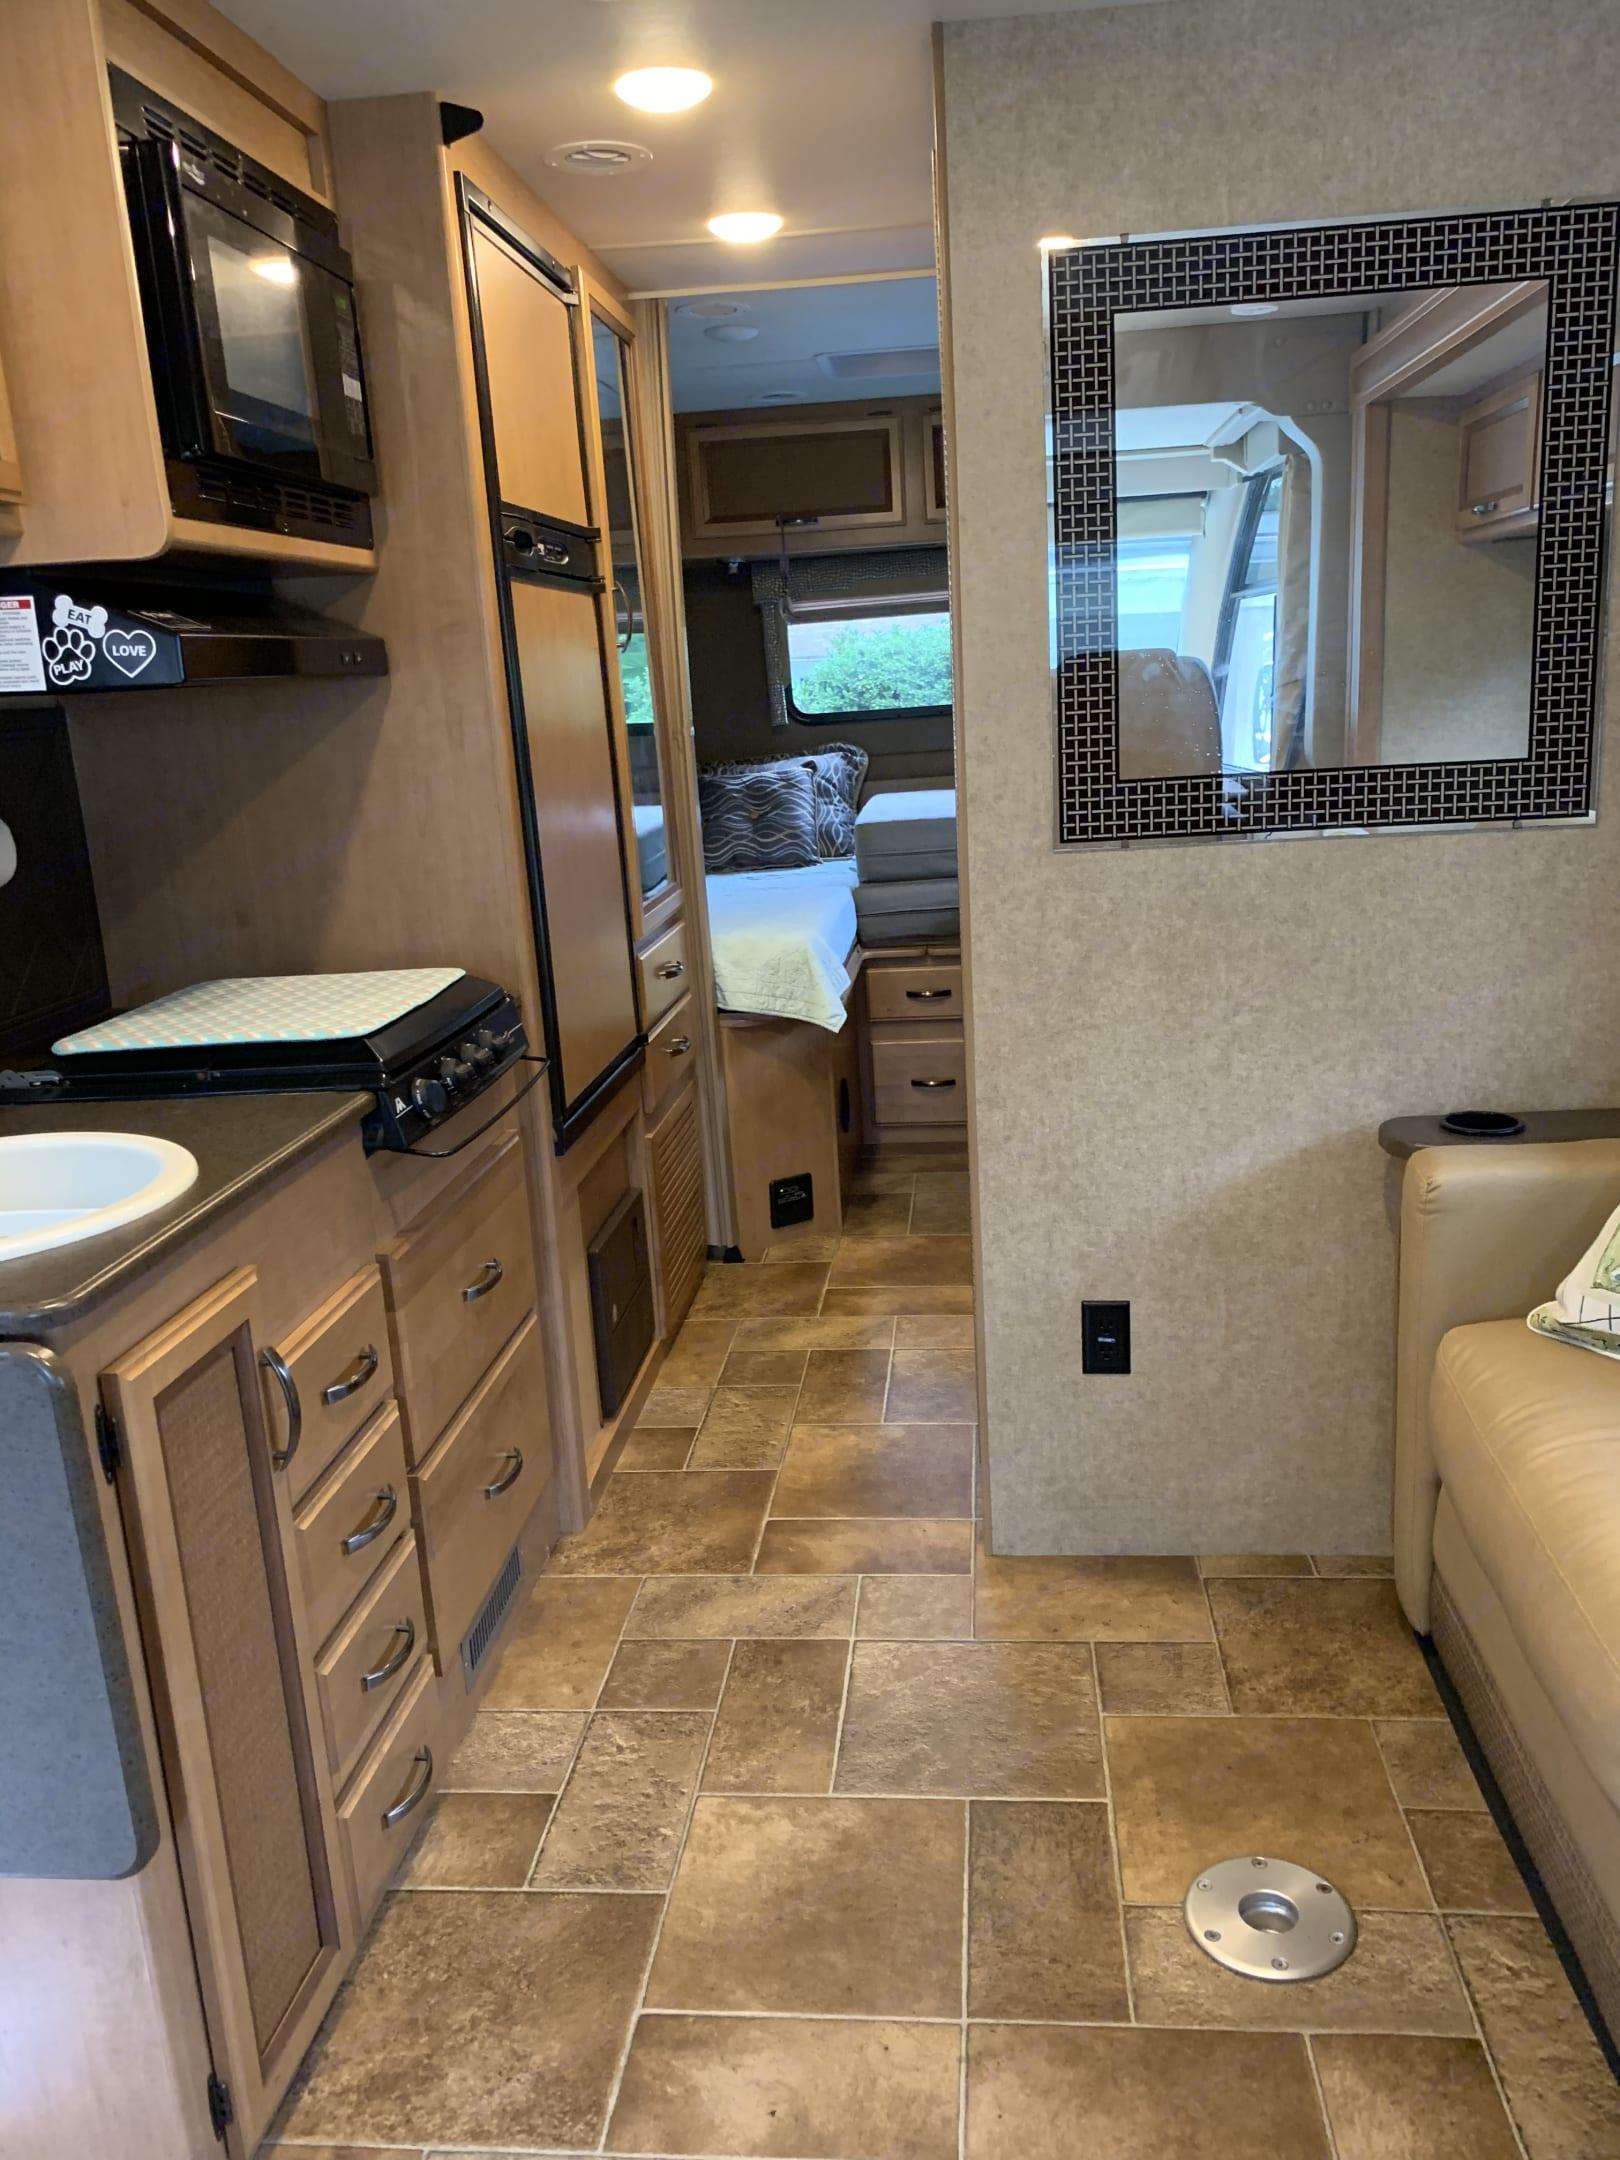 Kitchen area looking down hall towards bedroom. Thor Motor Coach Vegas 2016